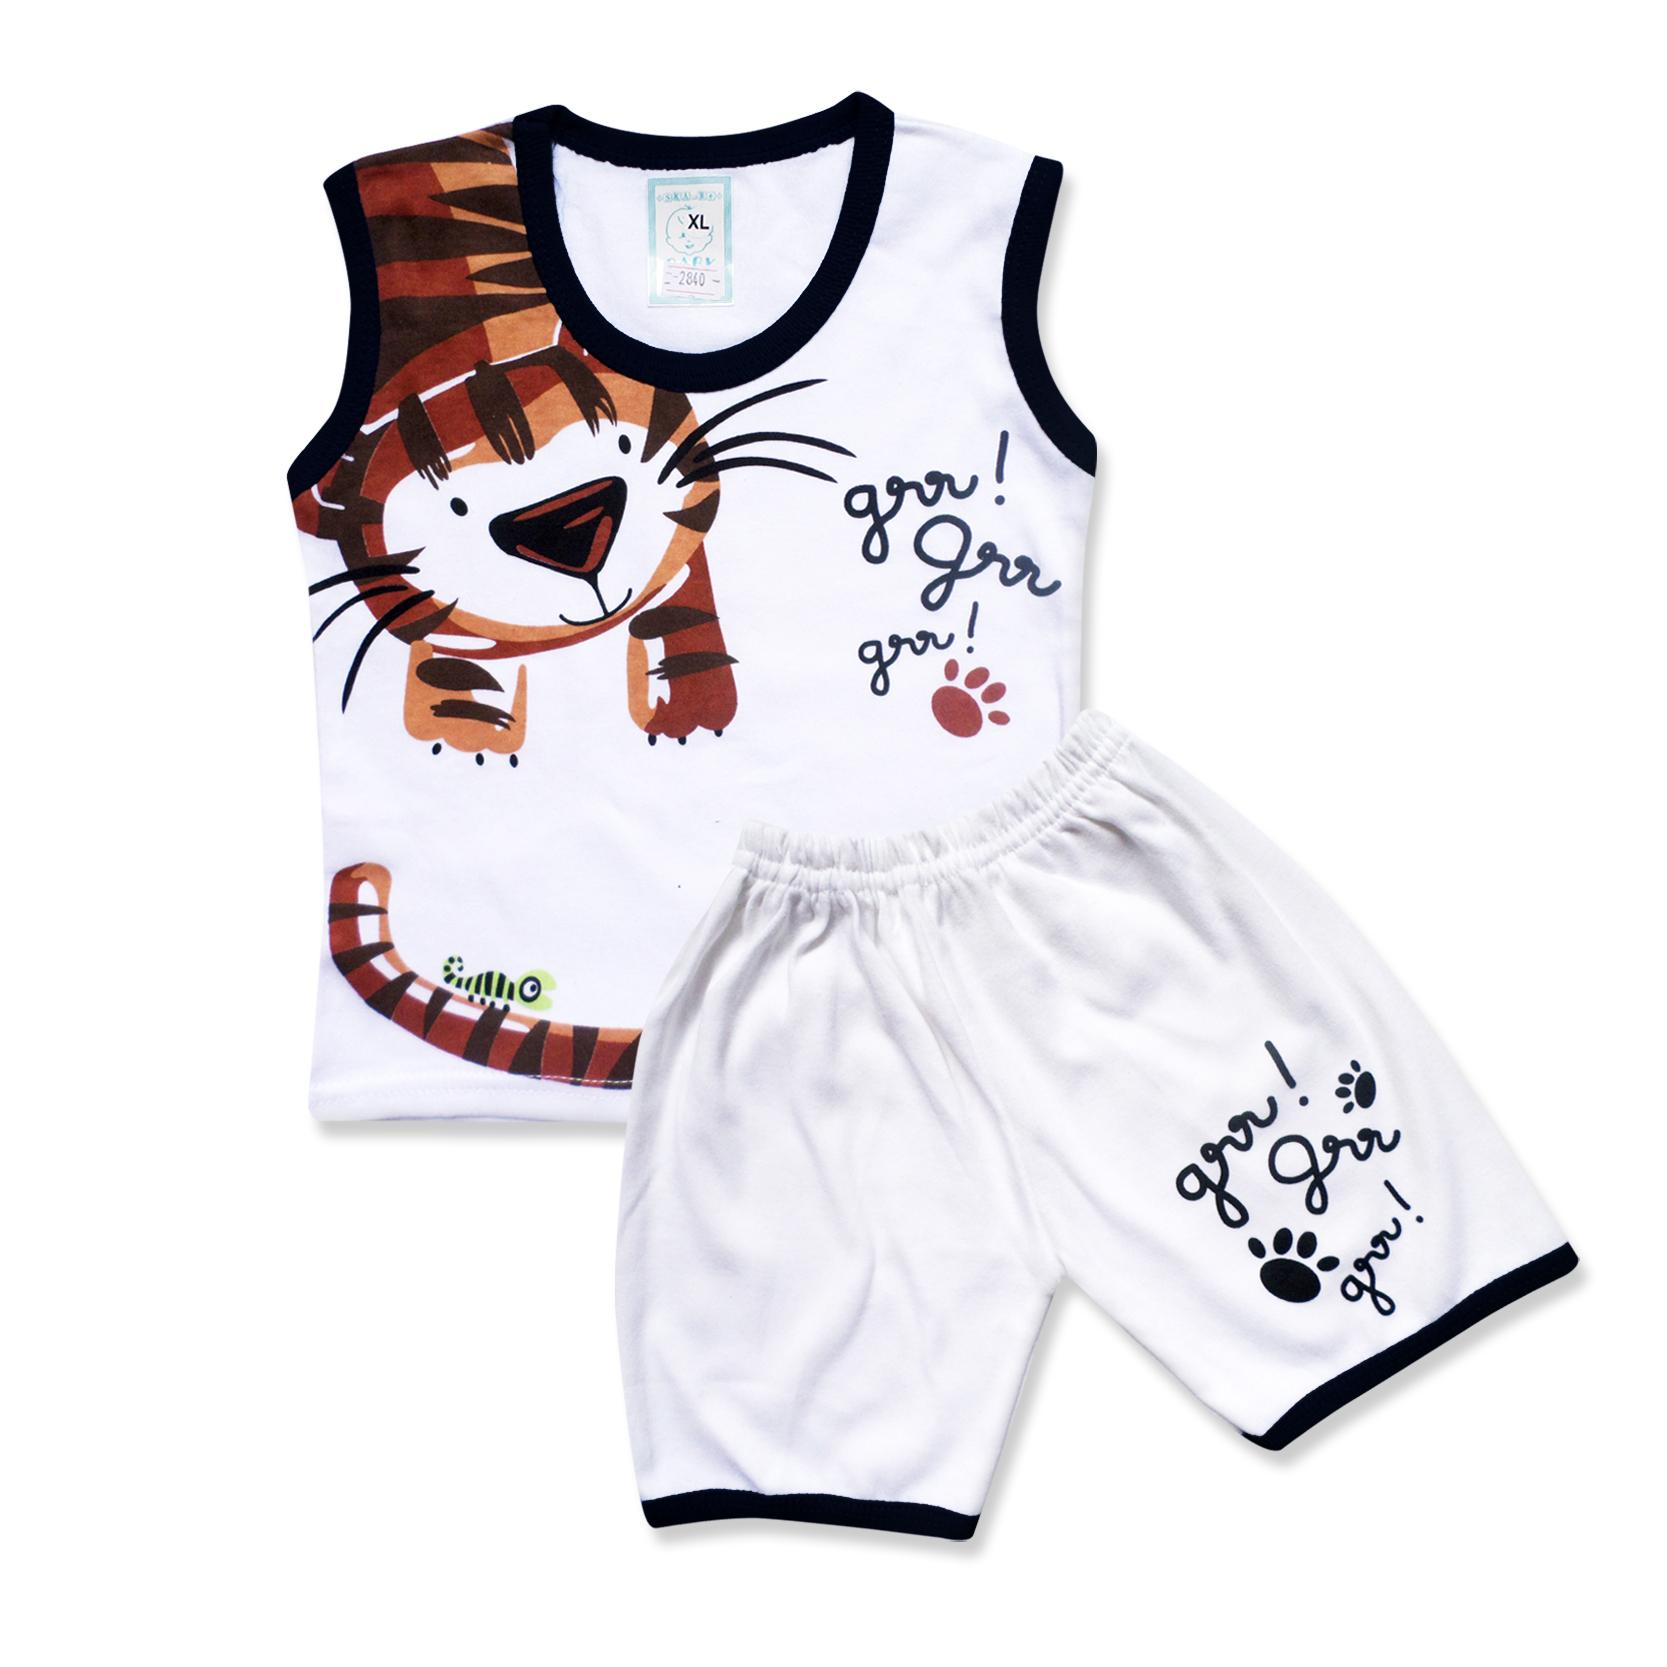 Skabe Baby Putih Baju Singlet Anak Bayi Laki Laki Setelan Kaos 2840 Everyday 8fc719f7fd